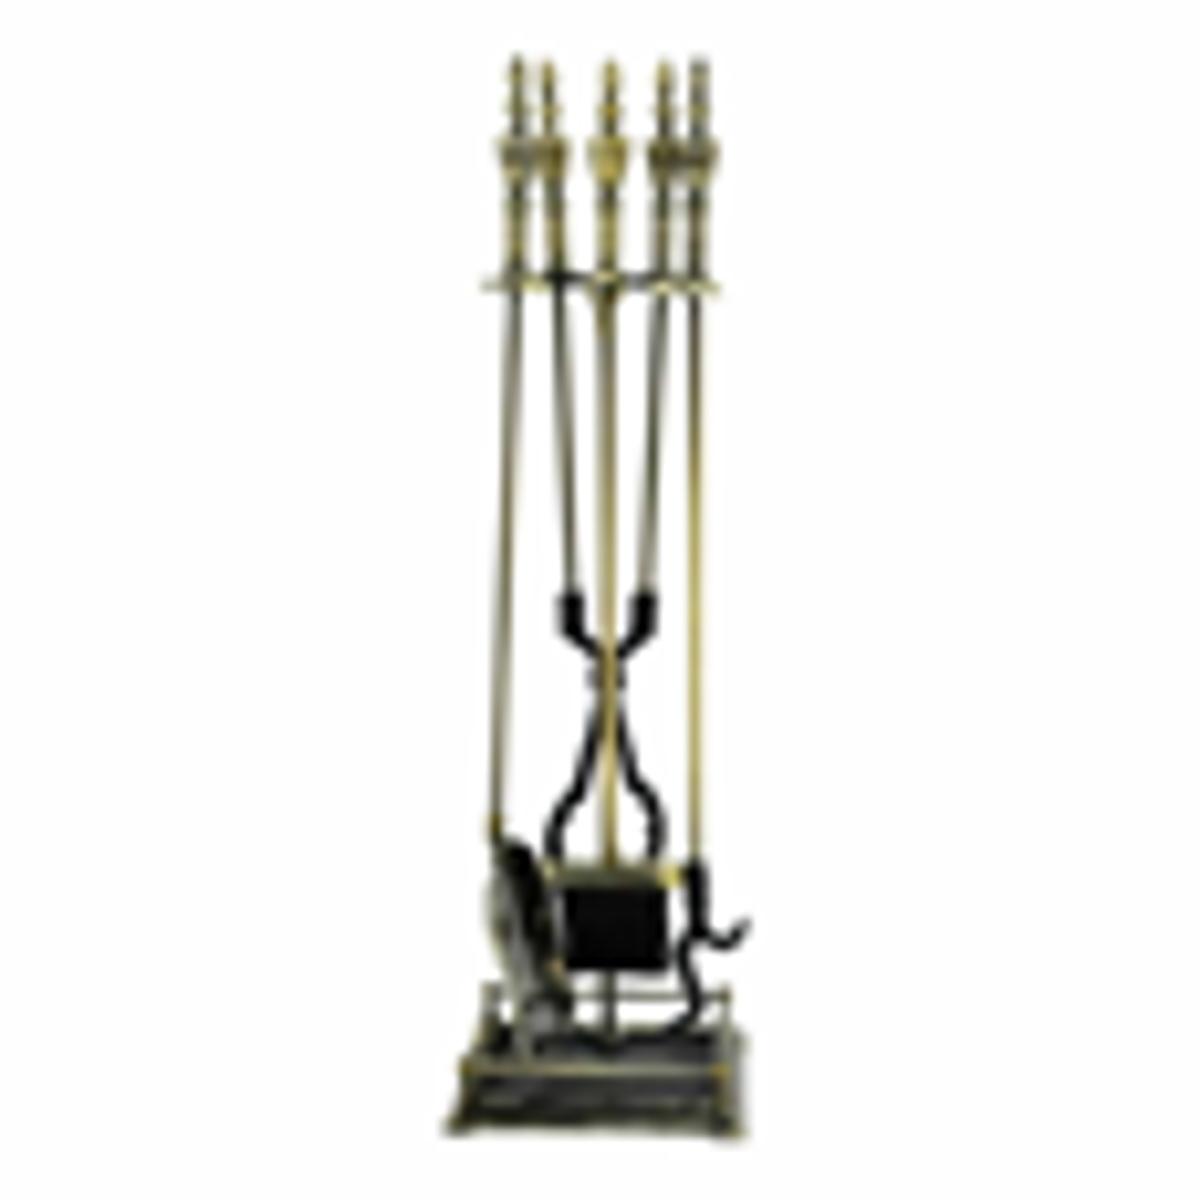 Brass Fireplace Tool Sets